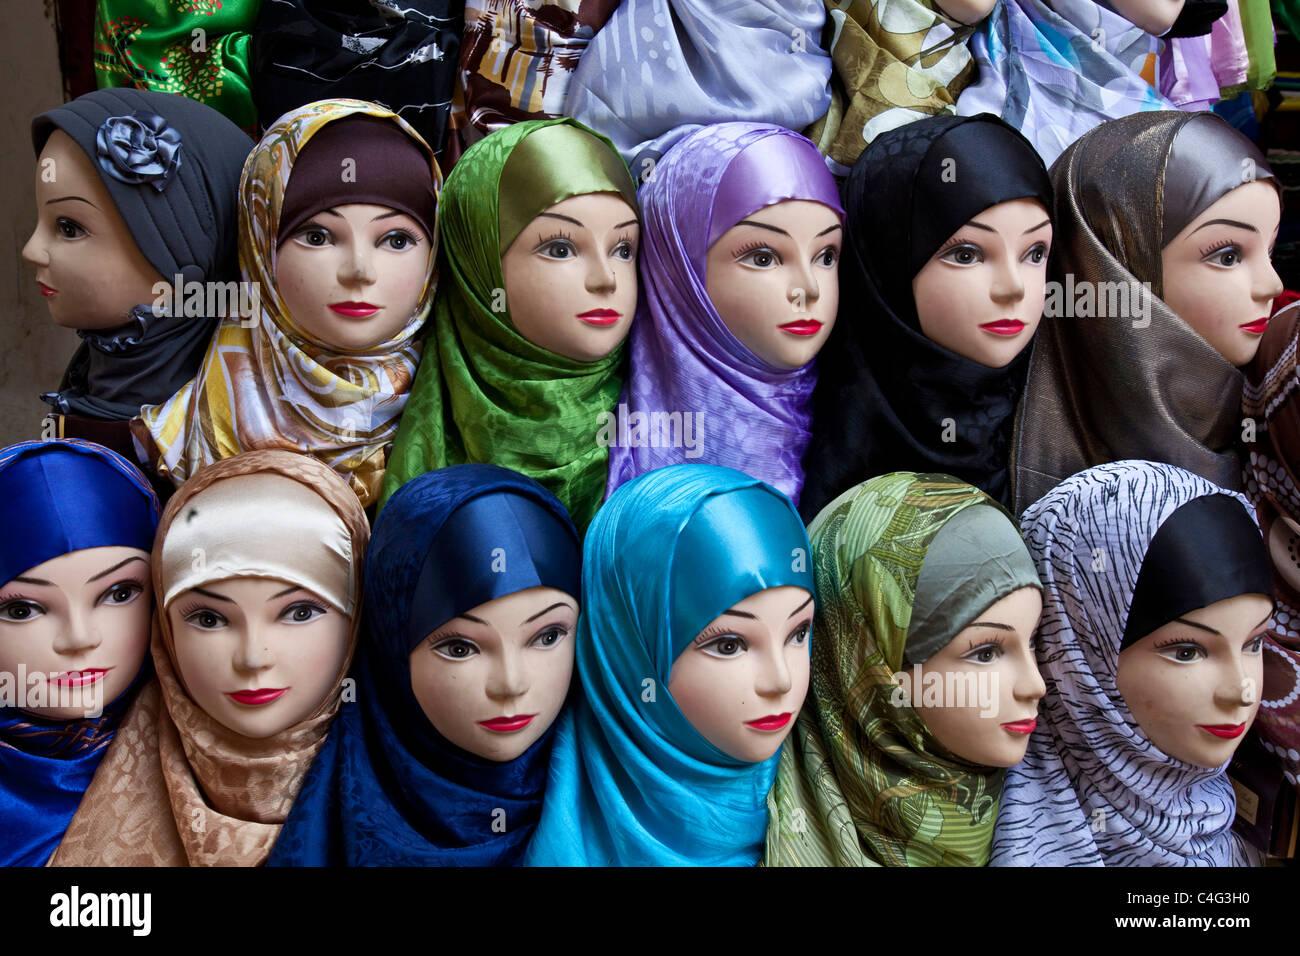 Womens headscarf display in a shop window, The Medina, Fez, Morocco Stock Photo